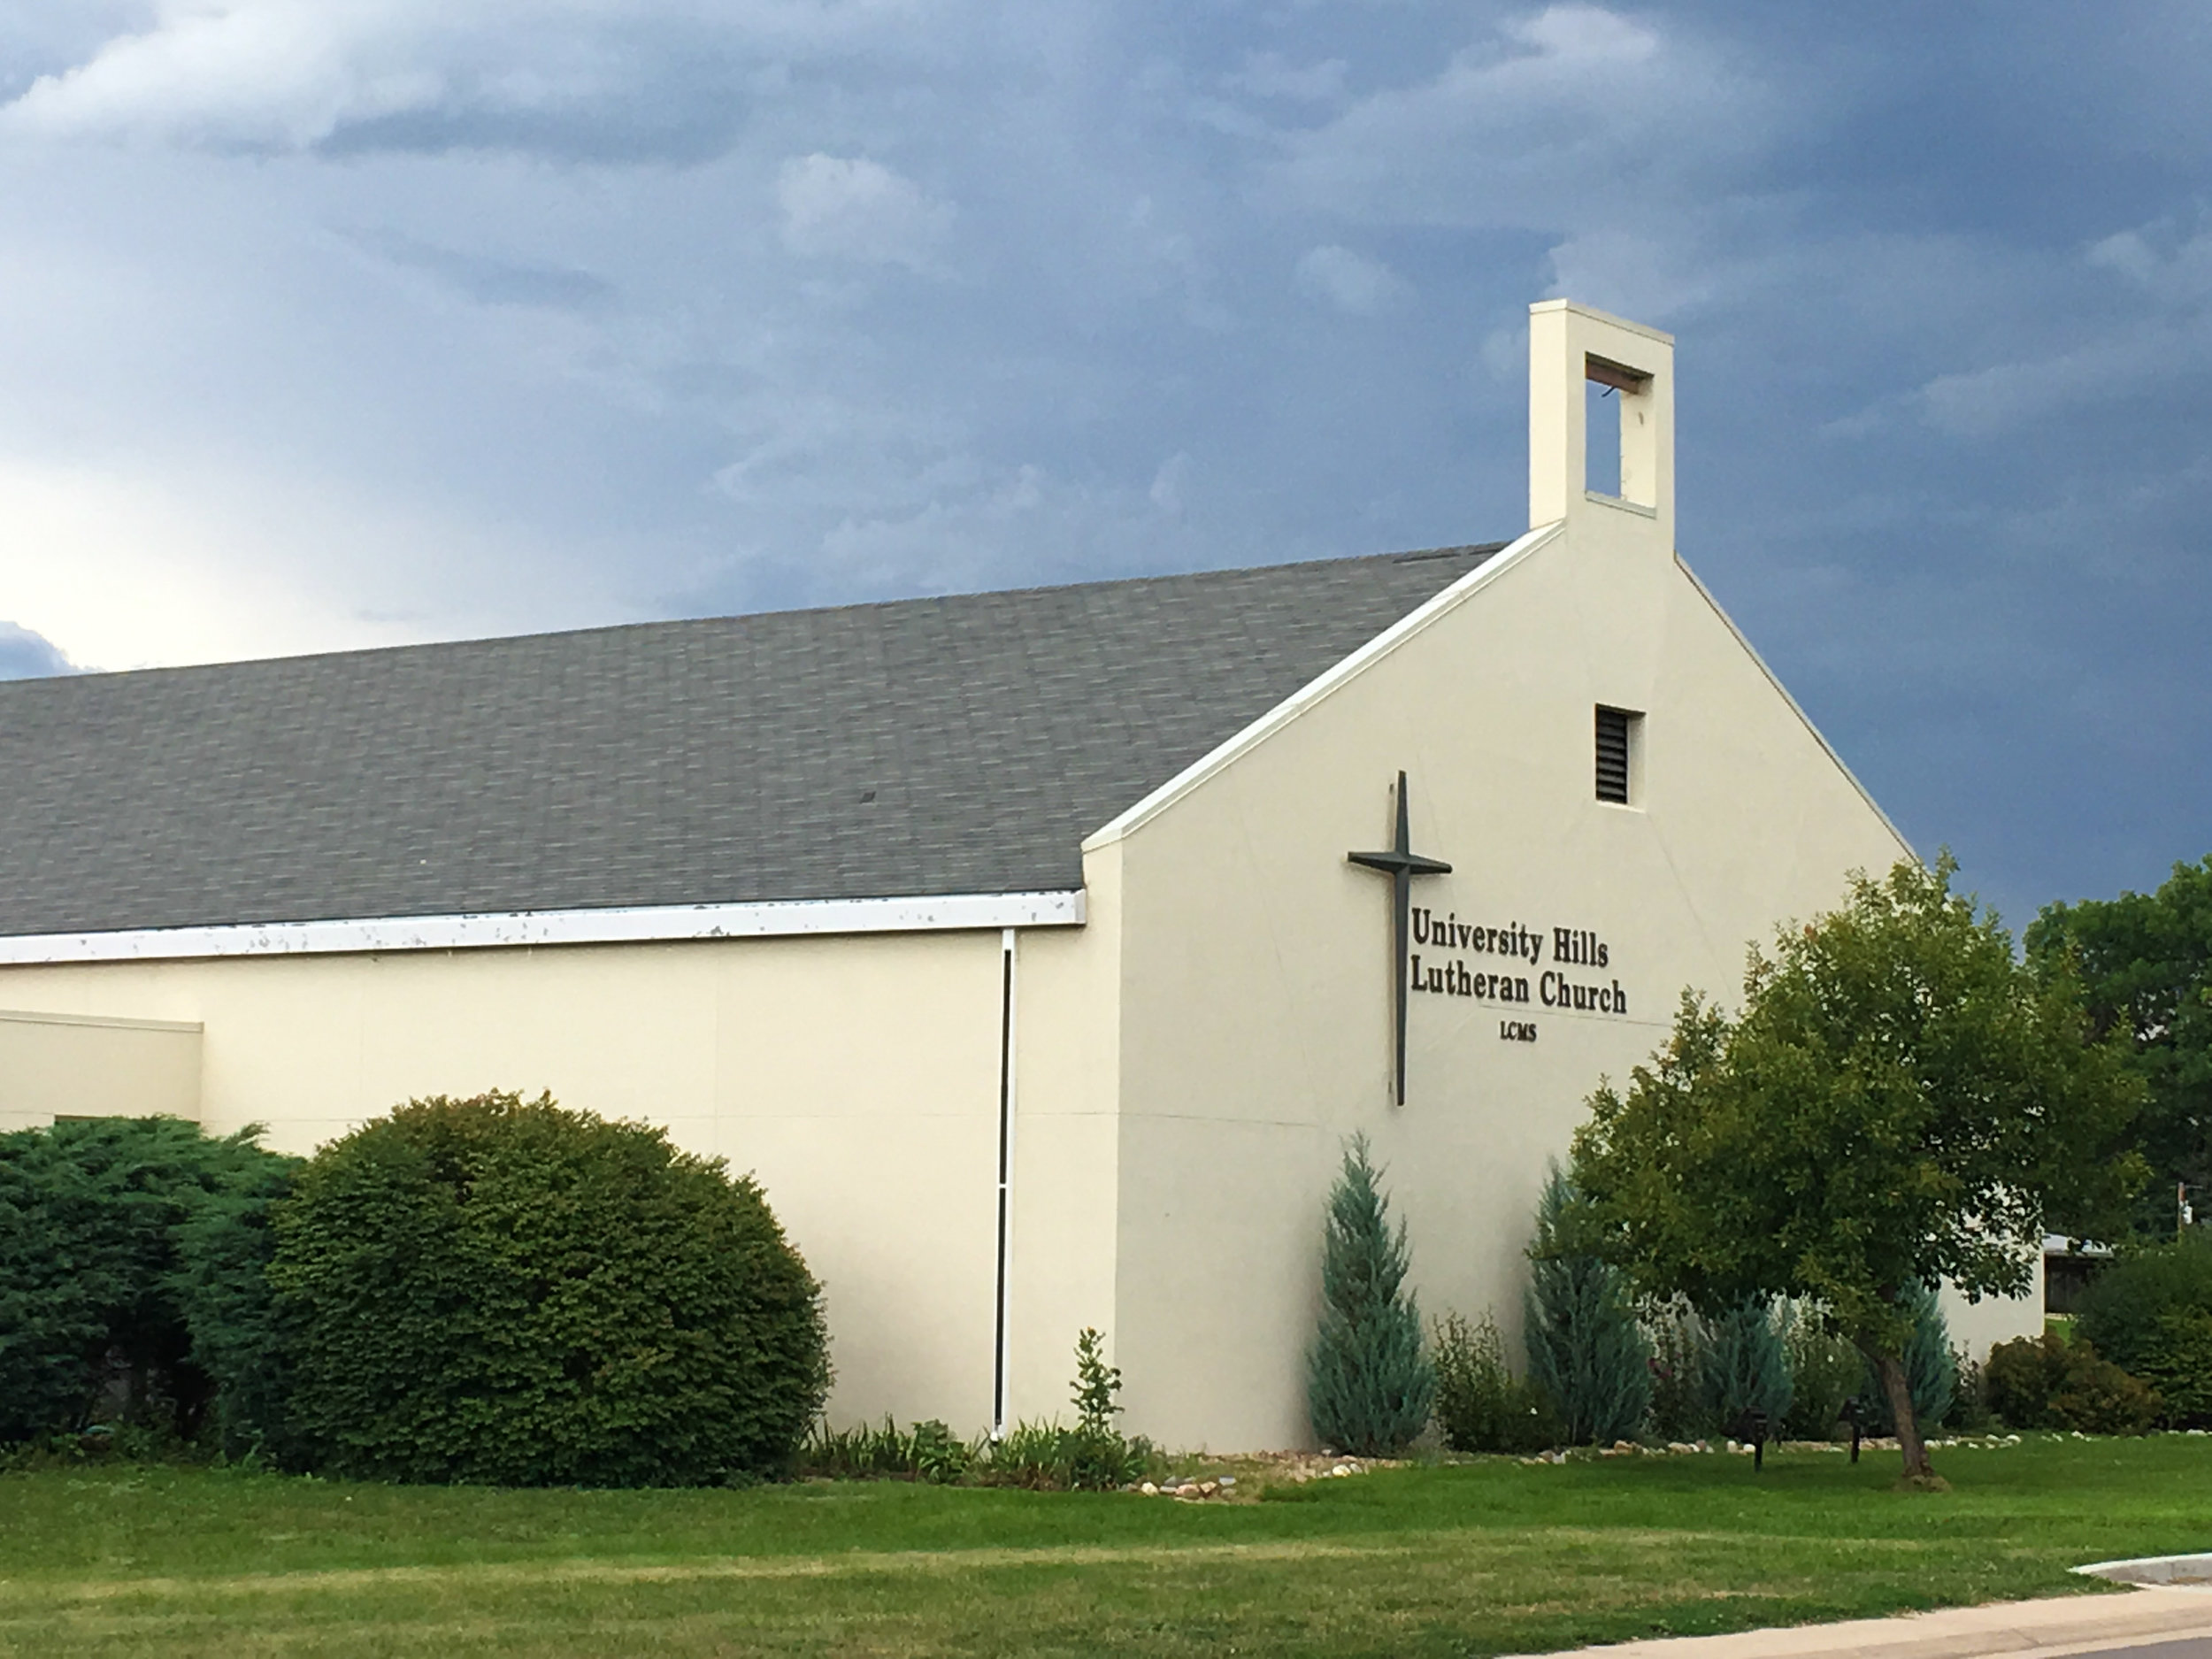 The multi-purpose building and sanctuary, dedicated 1987.